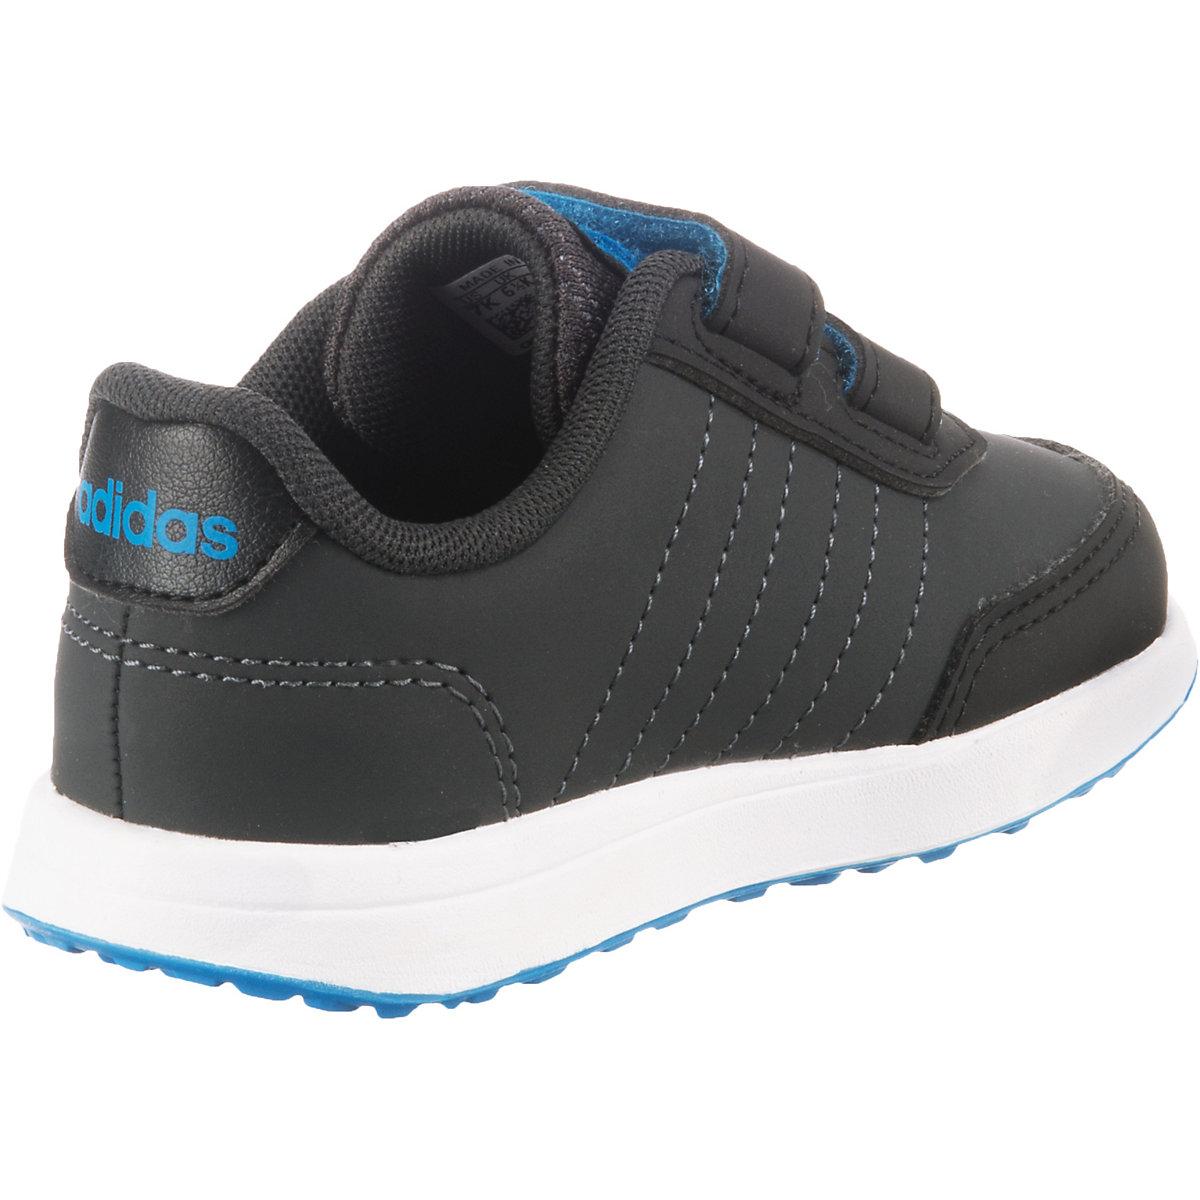 Adidas Sport Inspired, Baby Sneakers Low Vs Switch 2 Cmf Für Jungen, Blau